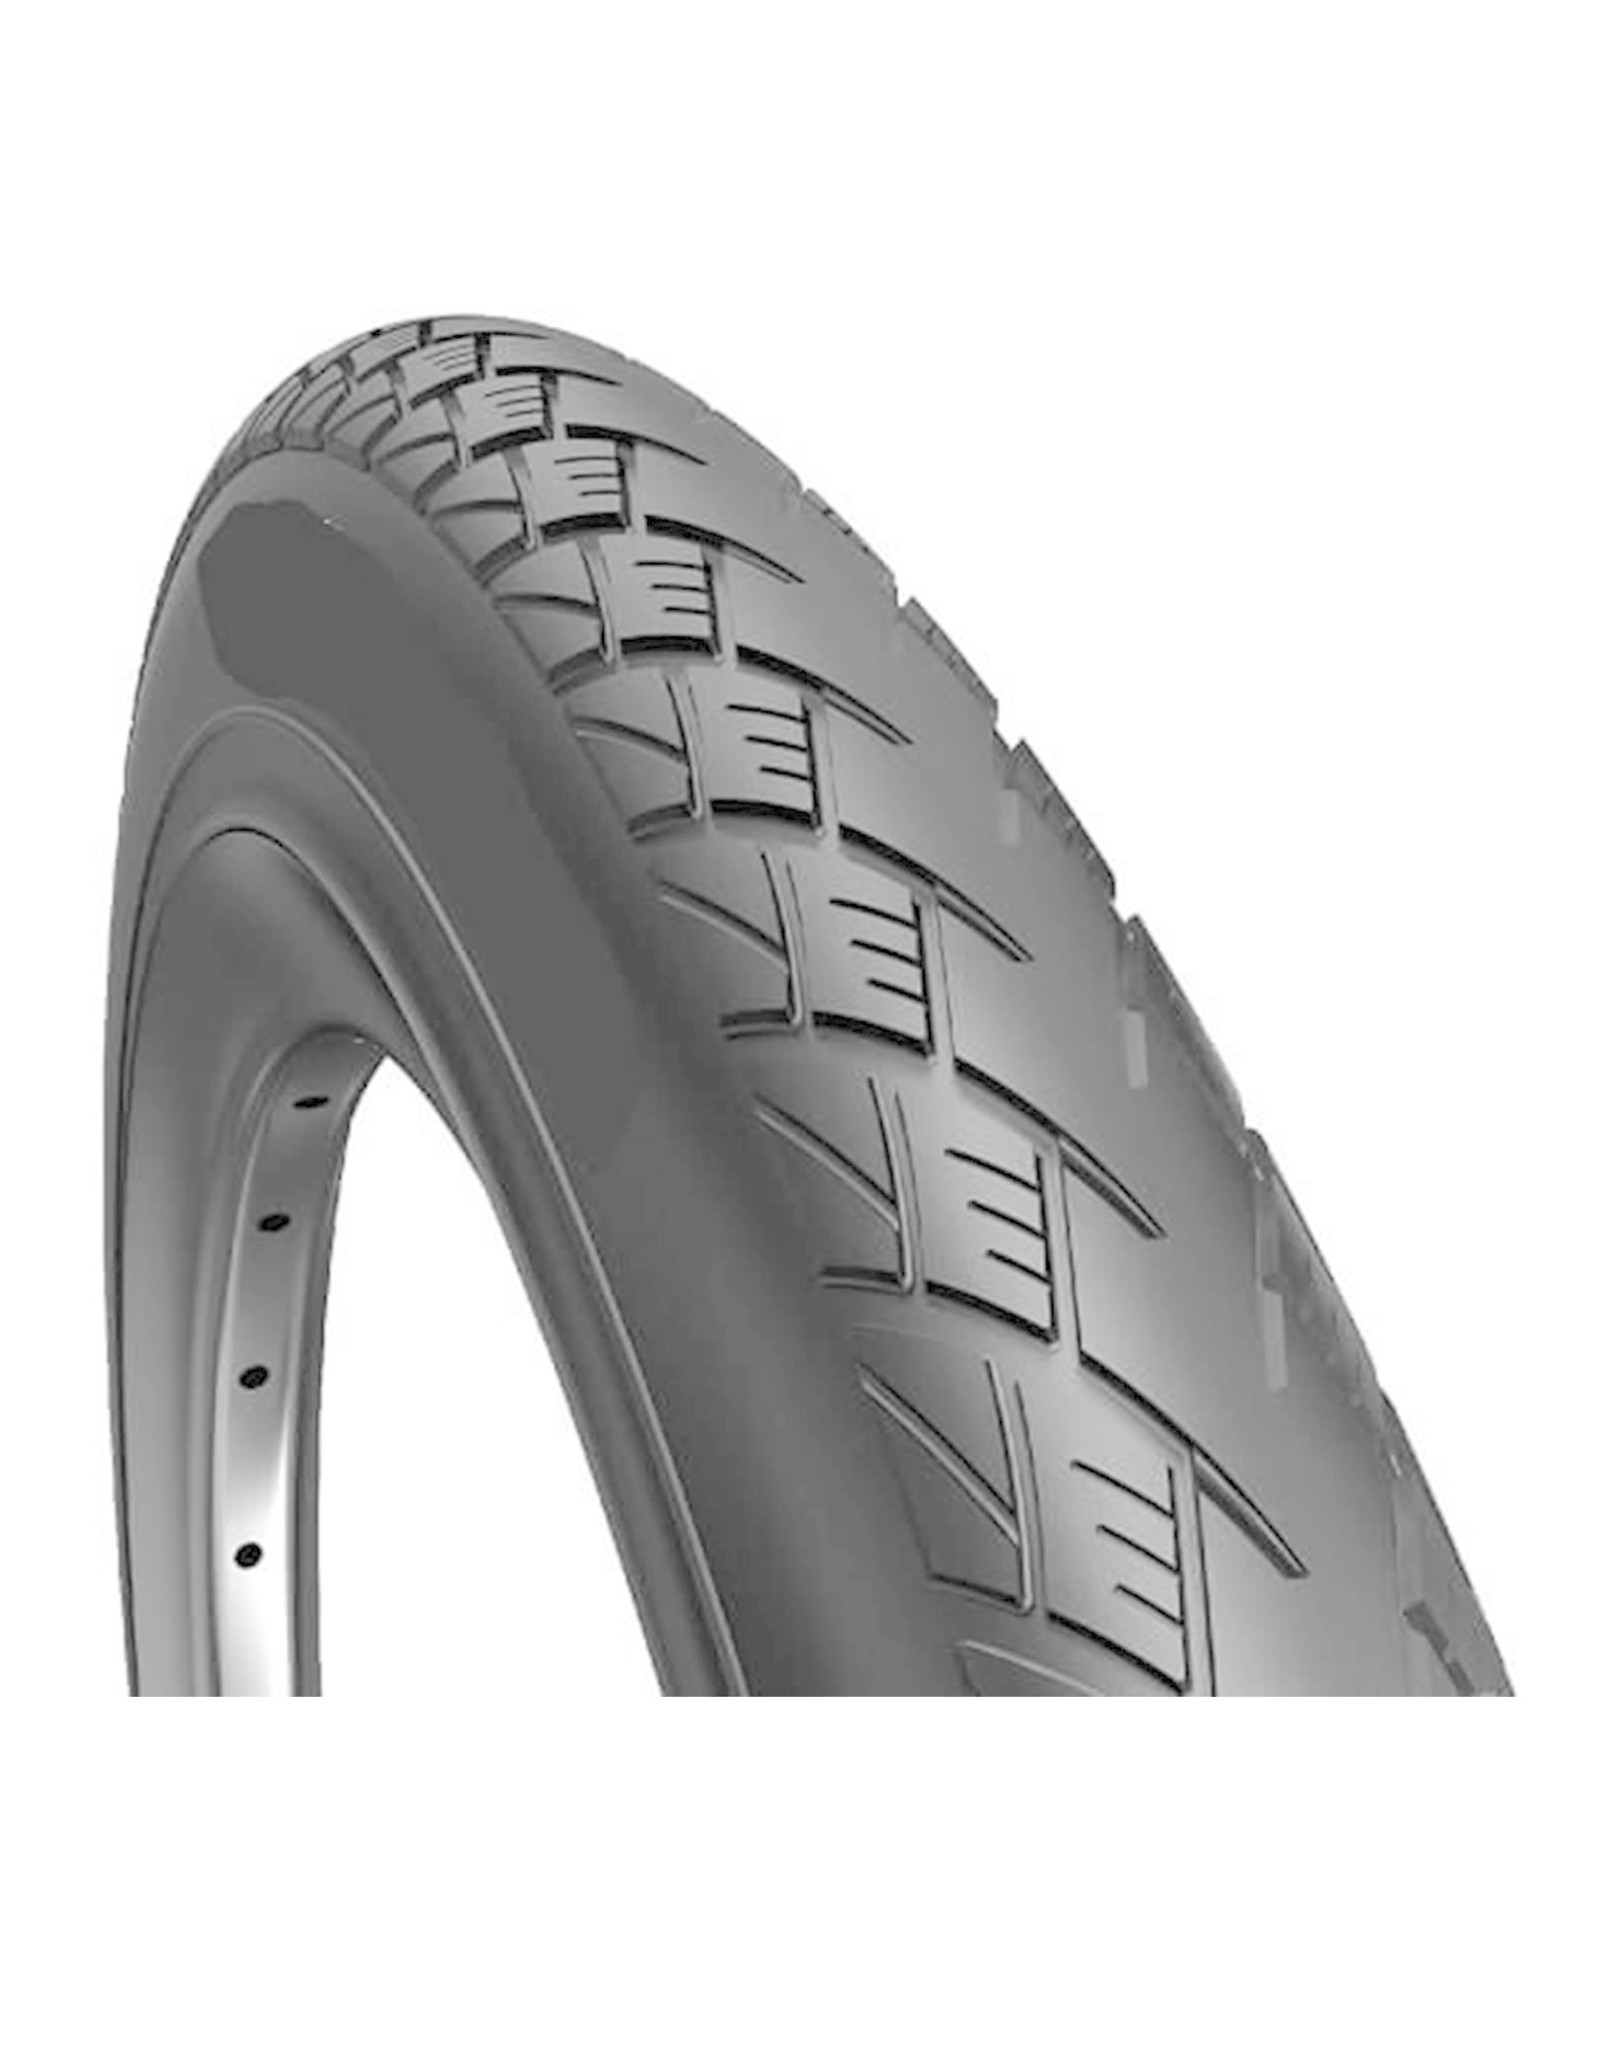 Rocket City Runner 700 X 38 PG Tyre